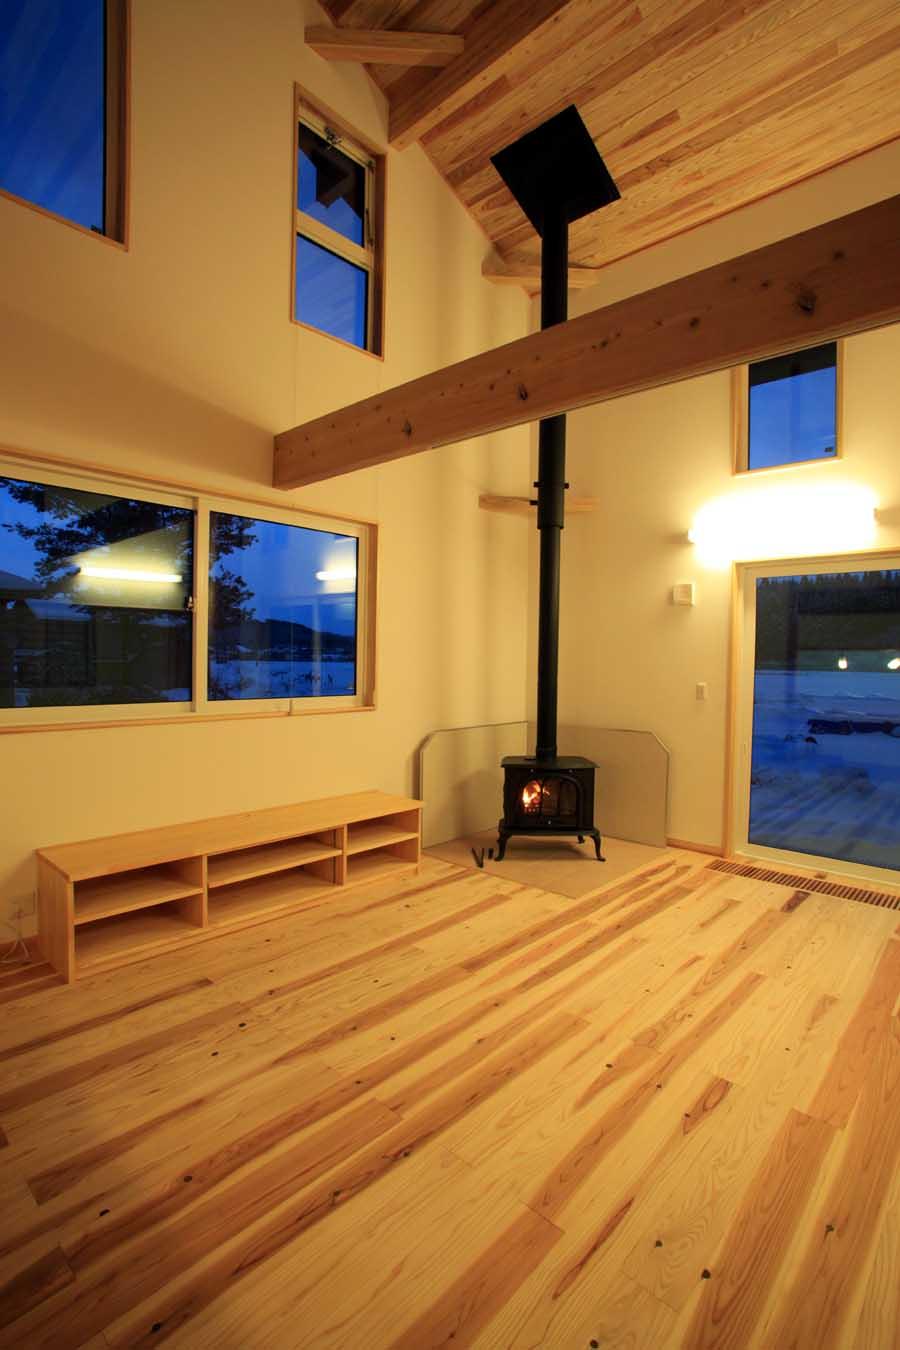 M様邸「三木田の家」 完成フォト_f0150893_19111359.jpg